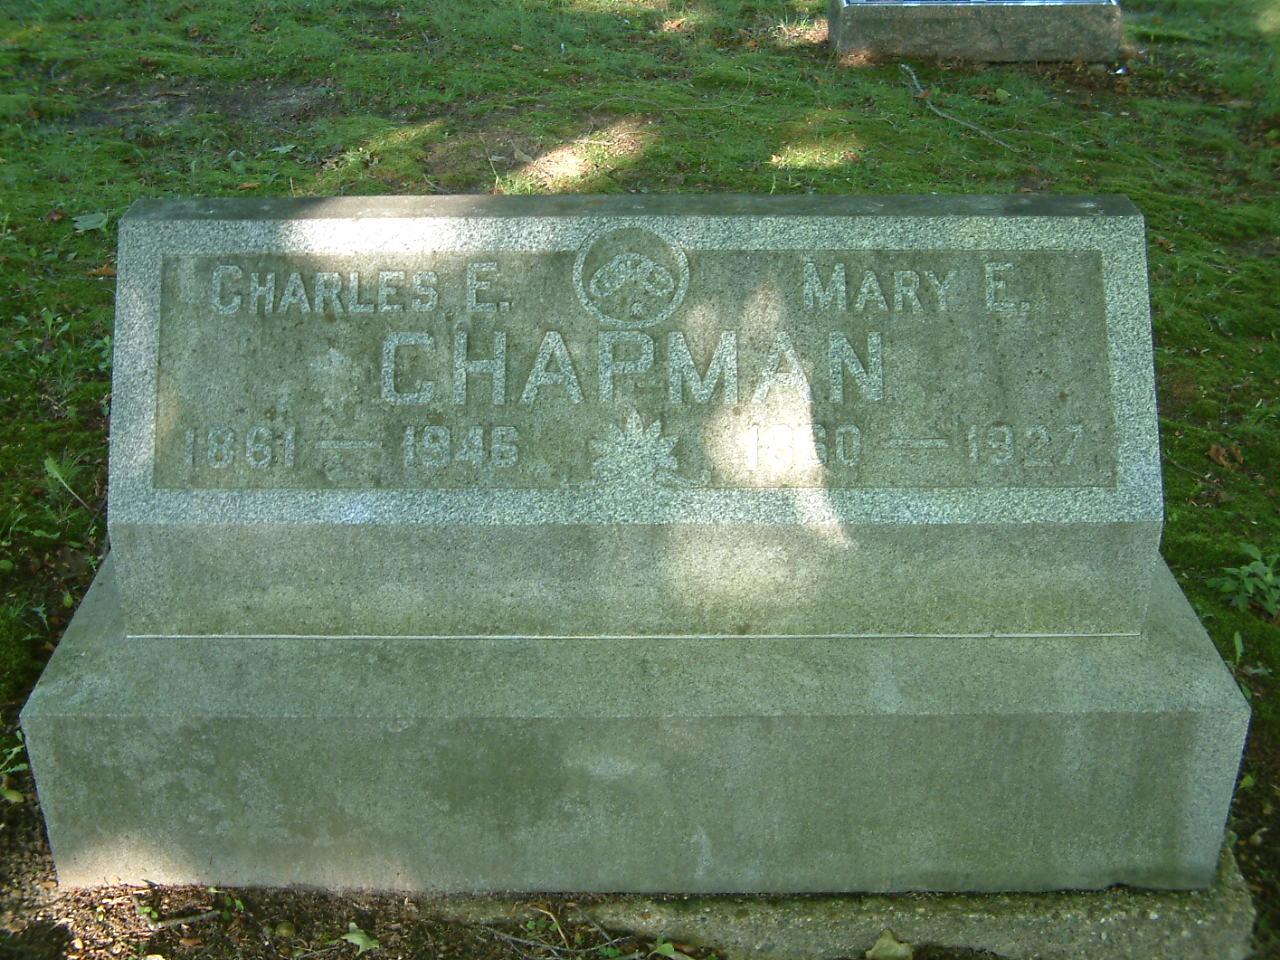 Charles Edward Chapman